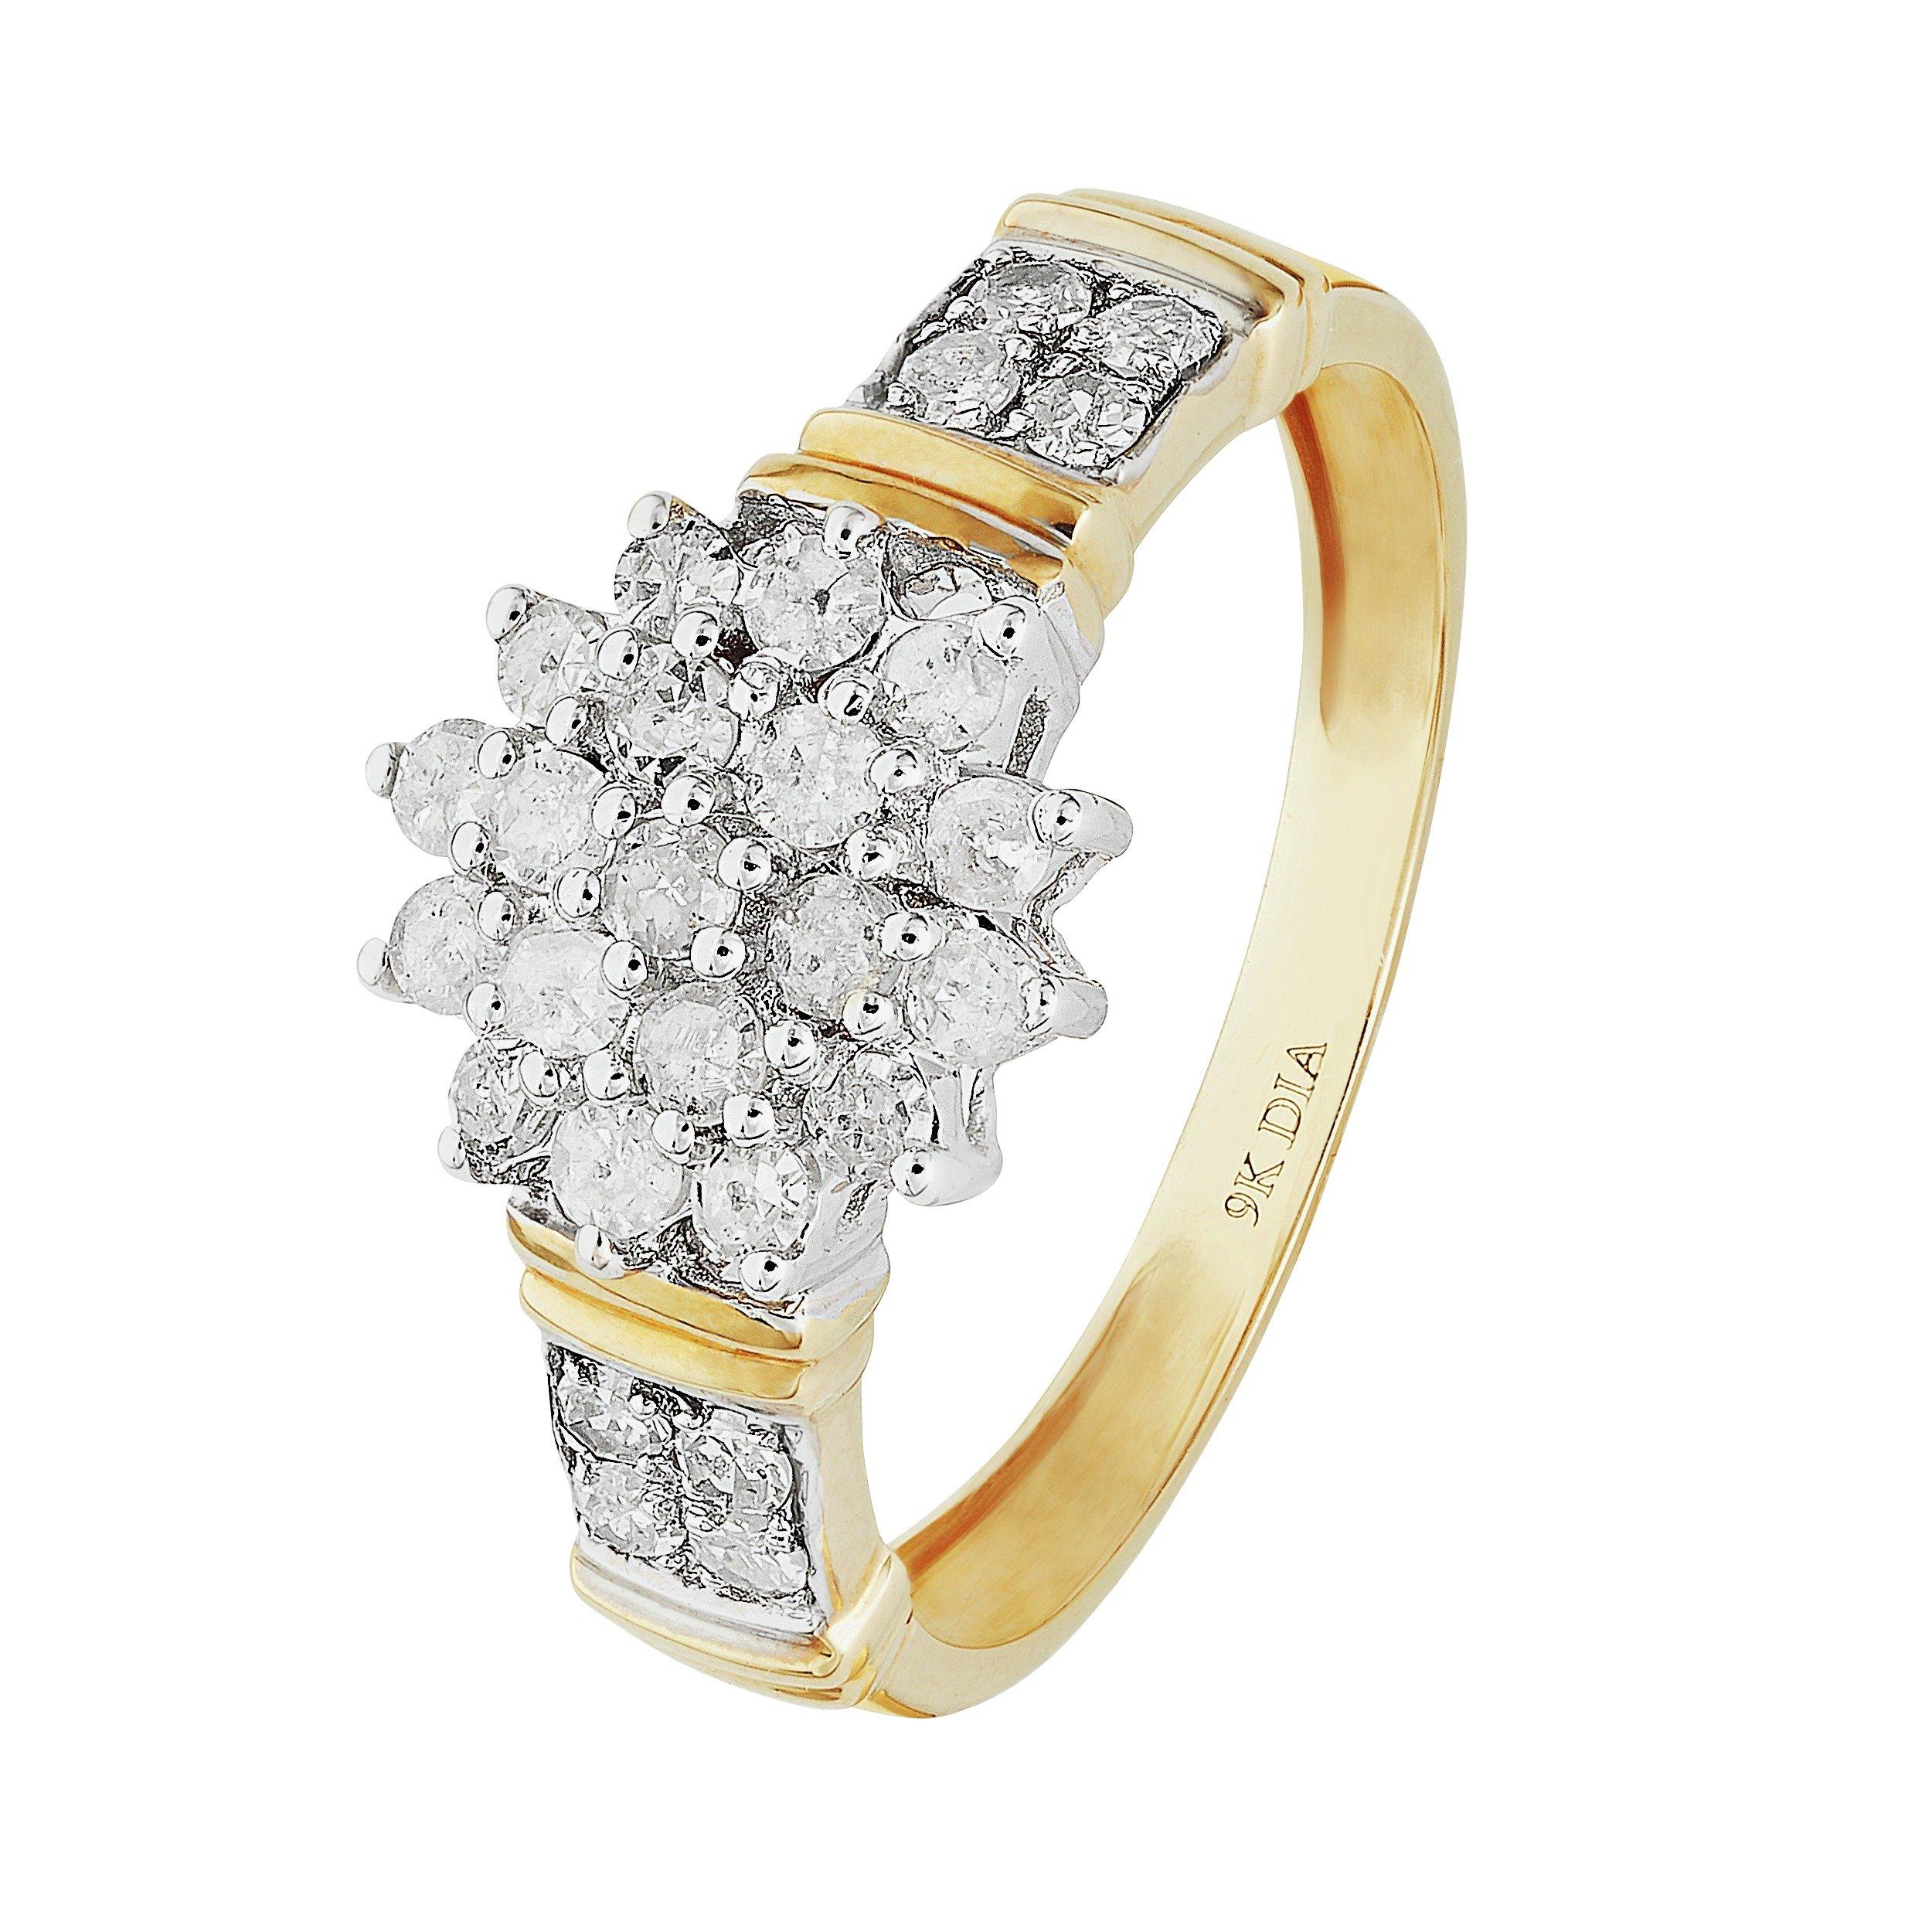 Buy Revere 9ct Gold 0 50ct tw Diamond Cluster Ring at Argos